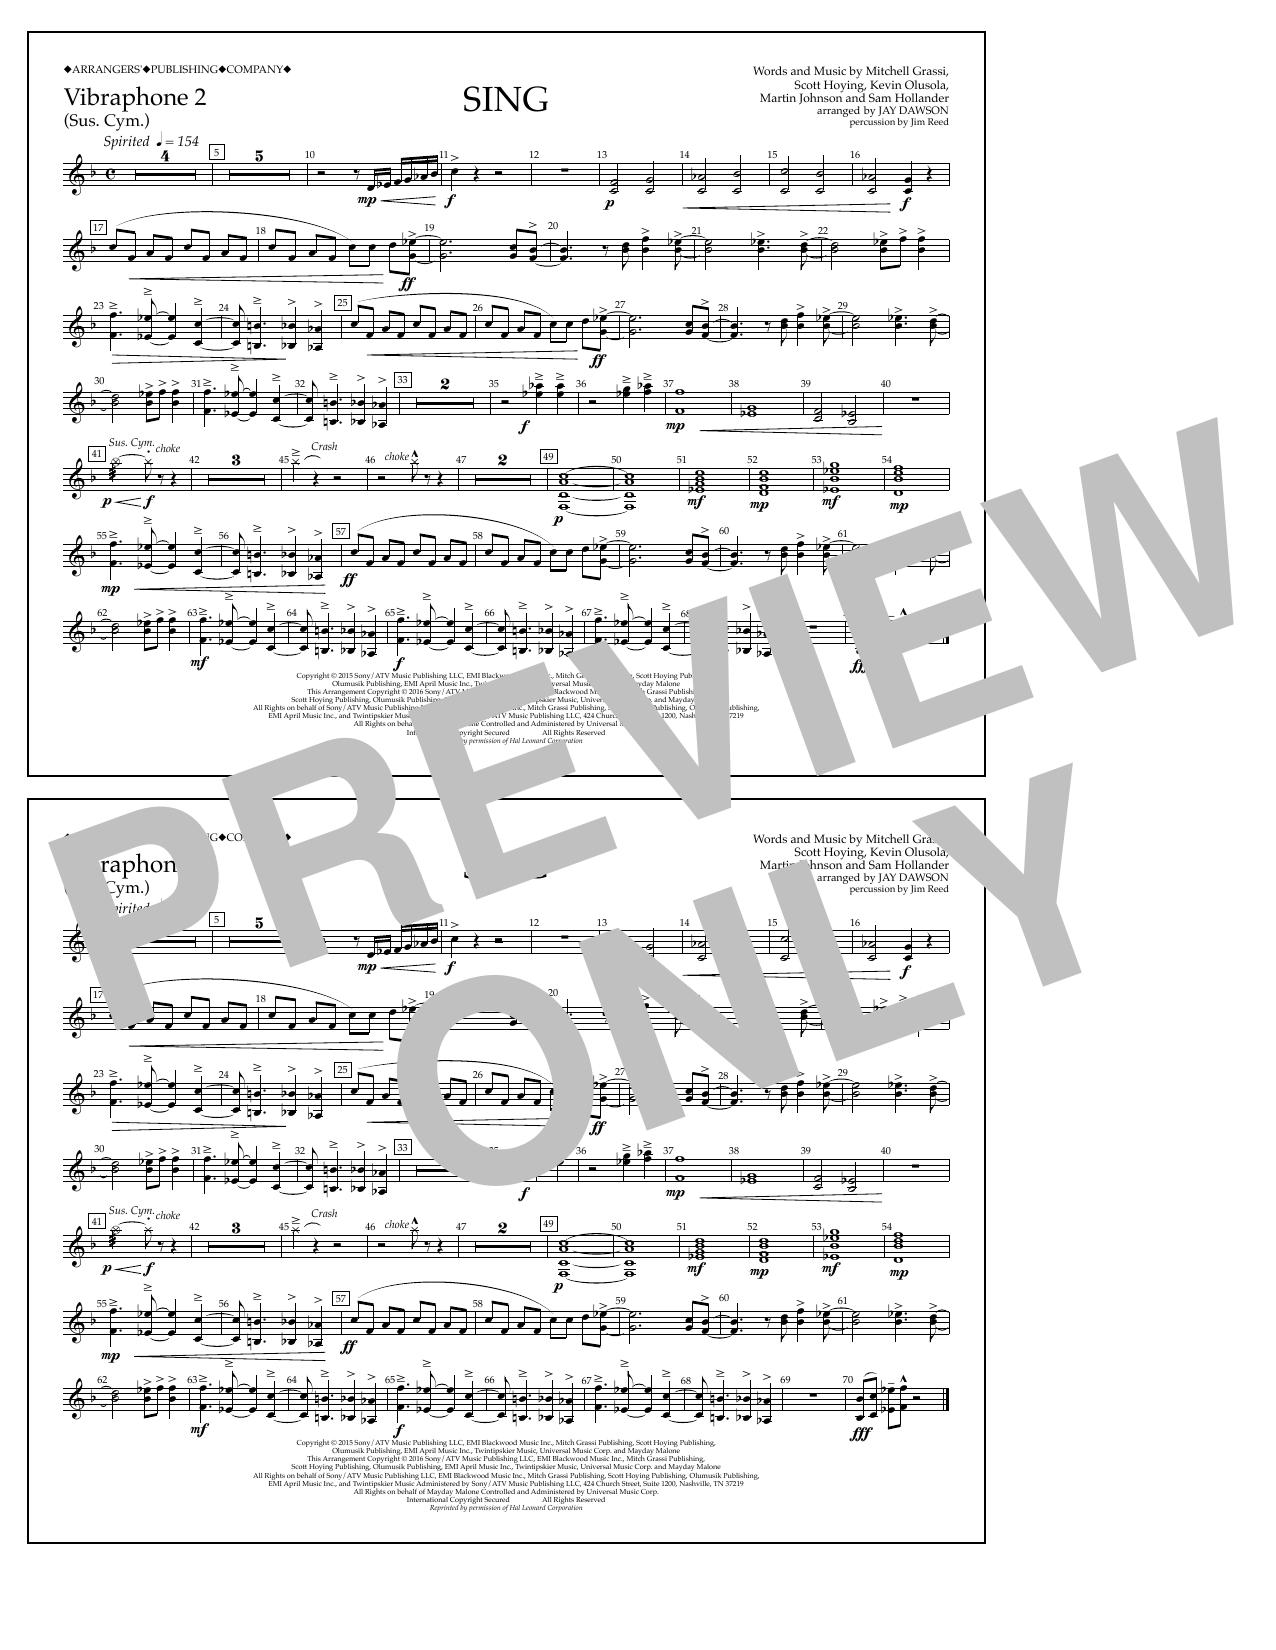 Pentatonix - Sing - Vibraphone 2